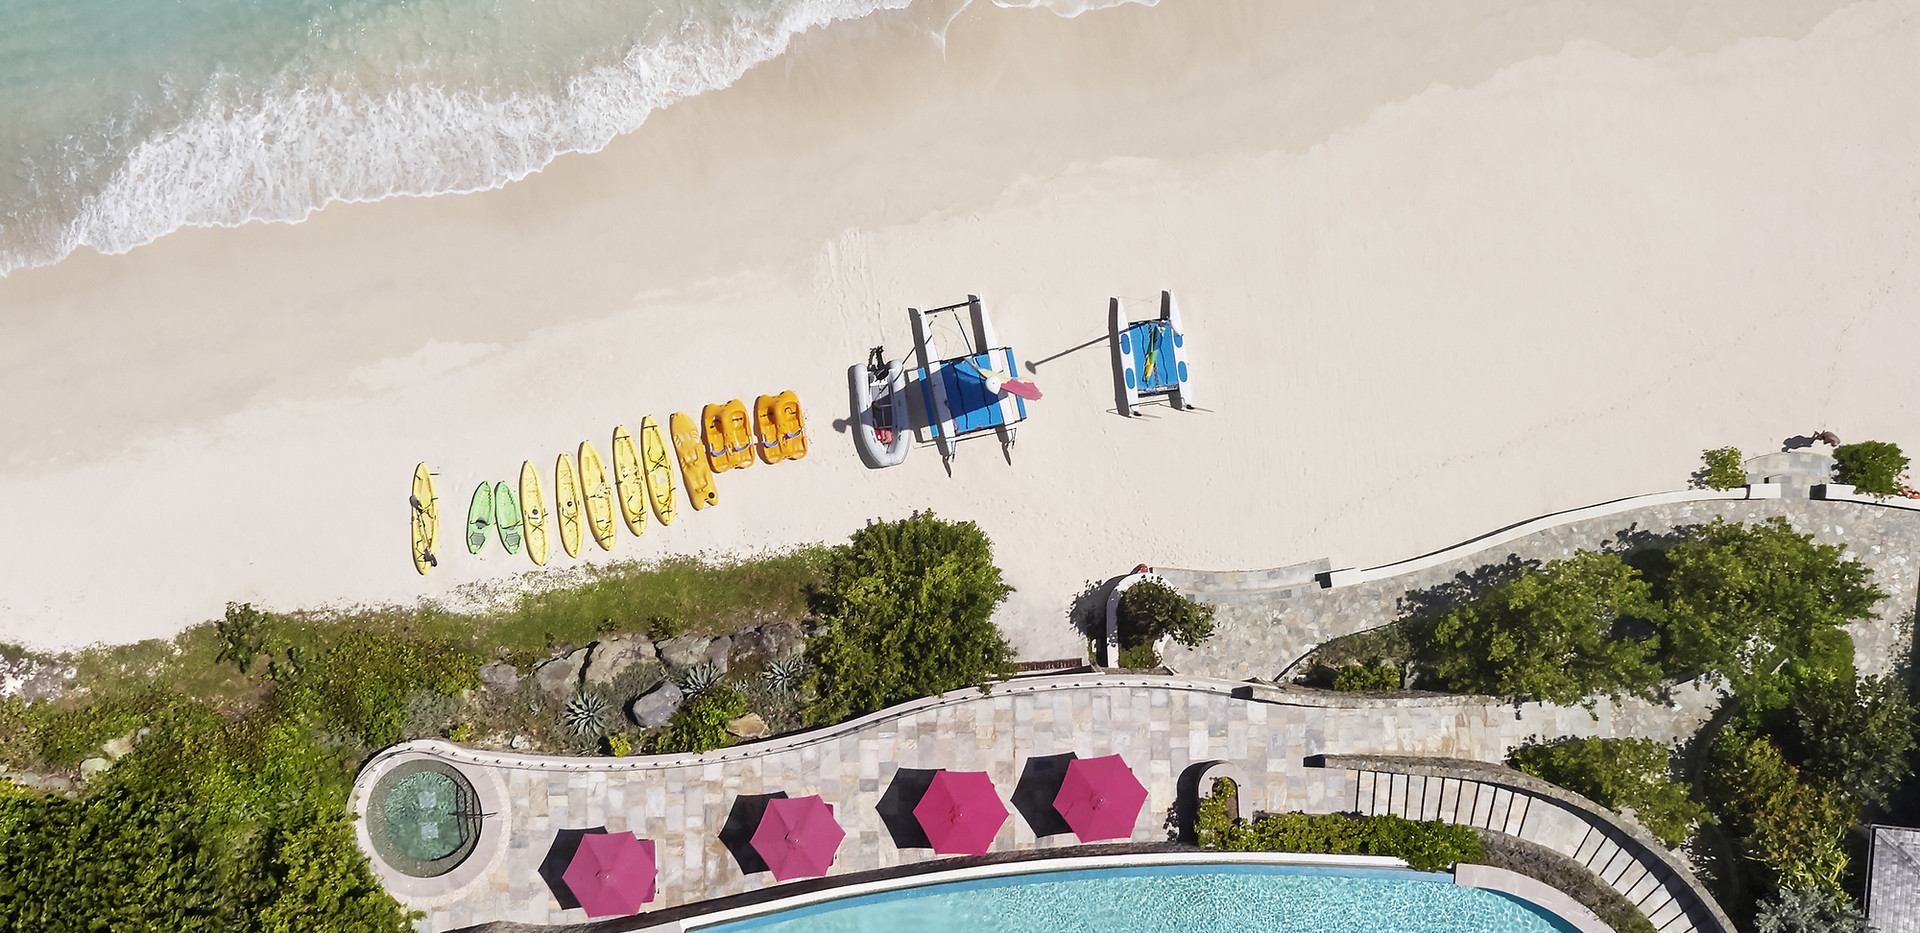 canouan-hotel-exterior-aerial-02.jpg